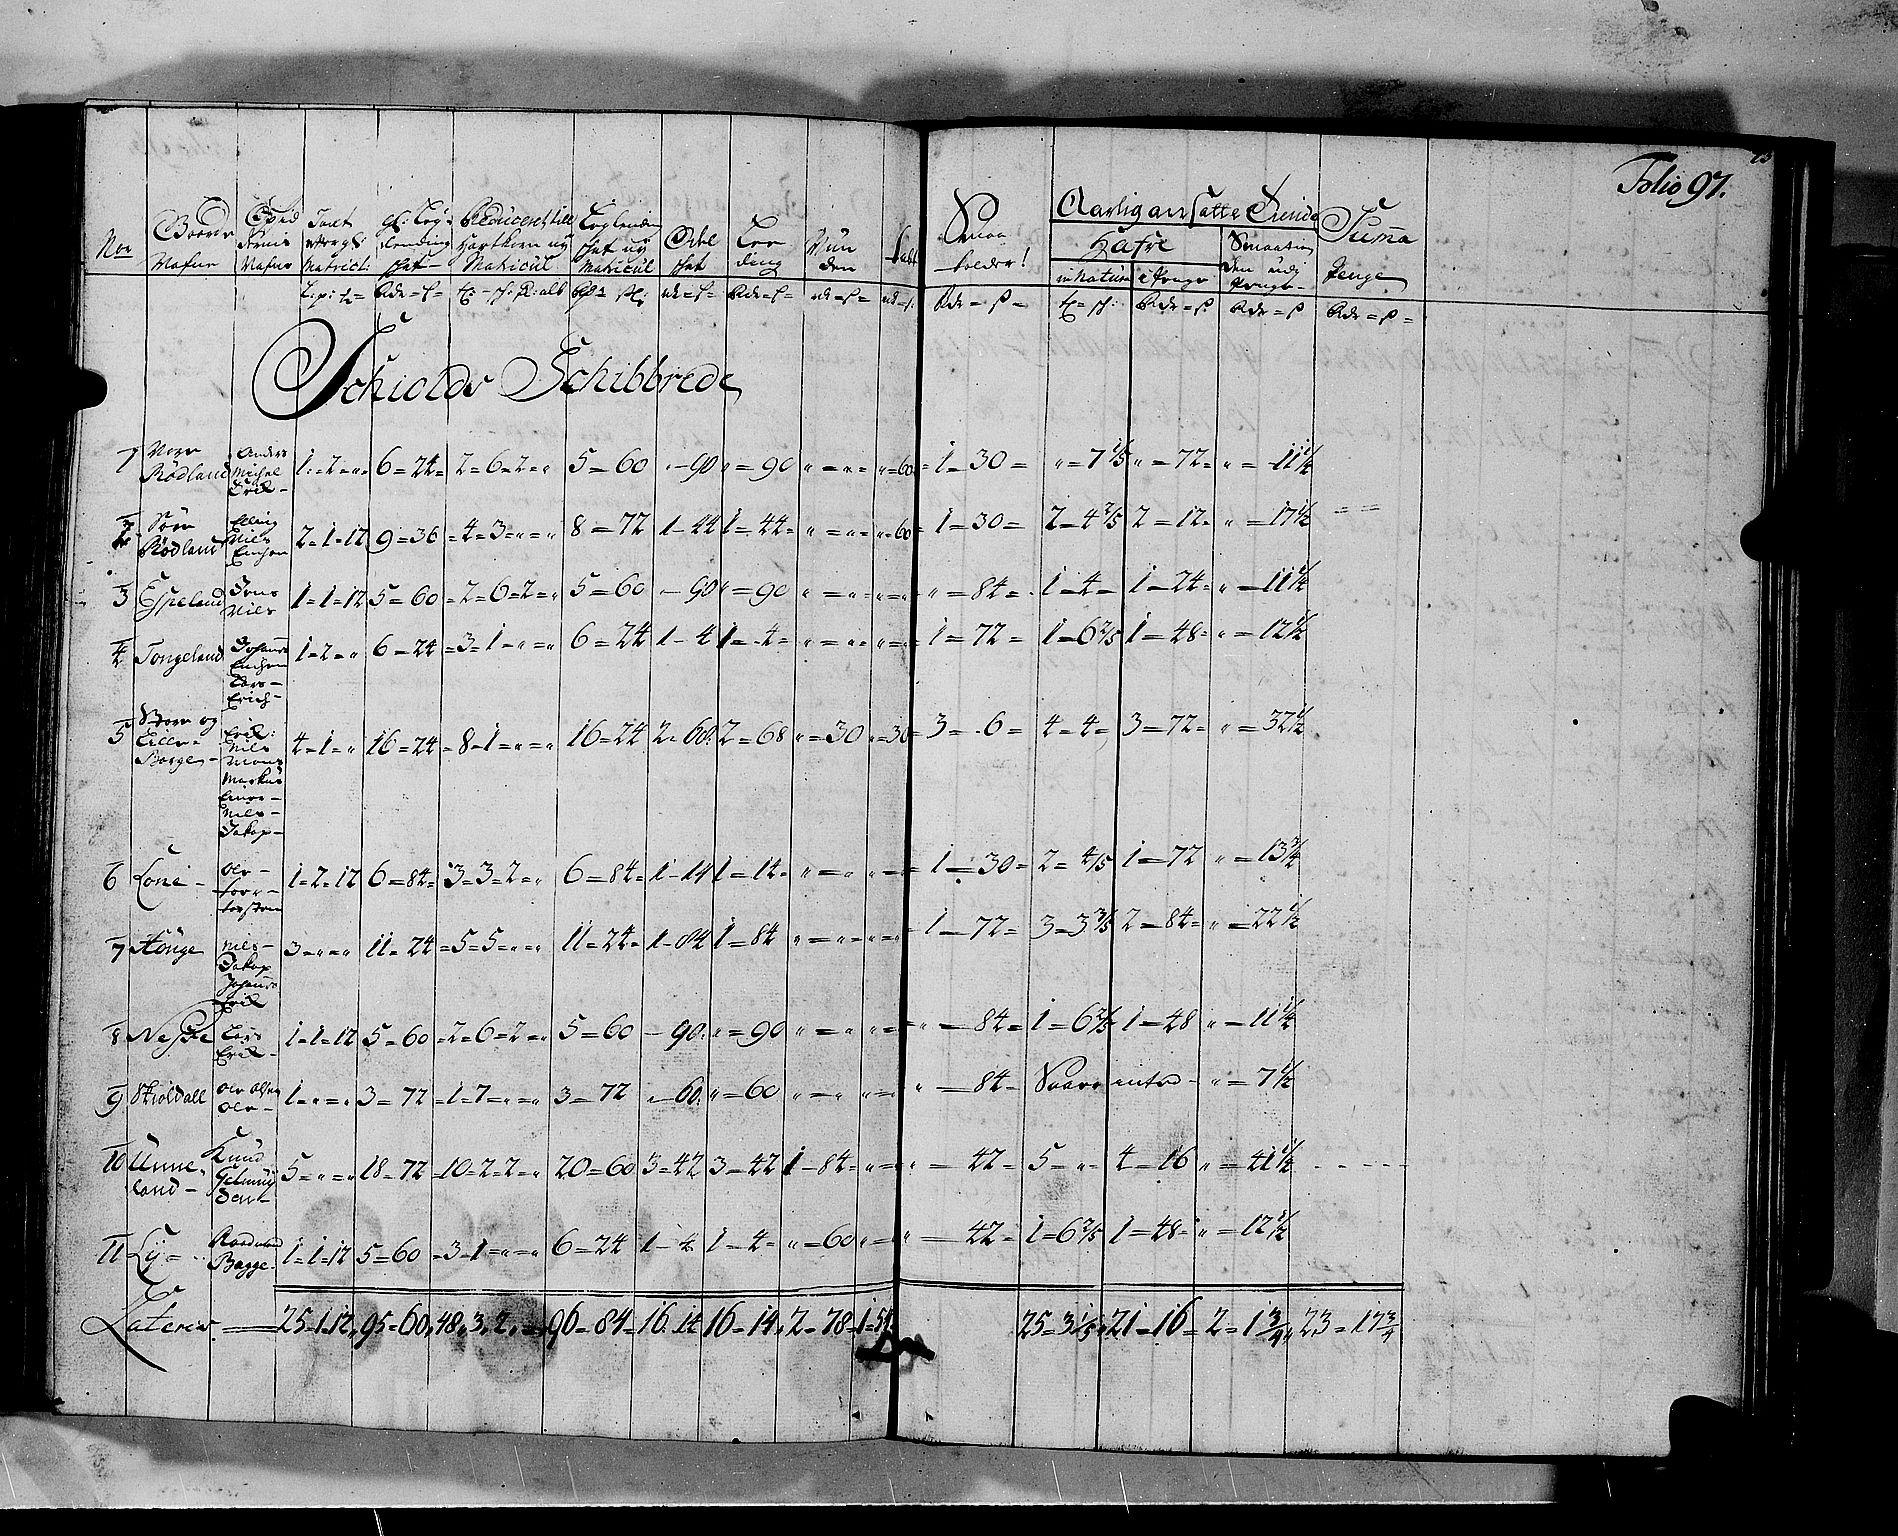 RA, Rentekammeret inntil 1814, Realistisk ordnet avdeling, N/Nb/Nbf/L0140: Nordhordland matrikkelprotokoll, 1723, s. 96b-97a